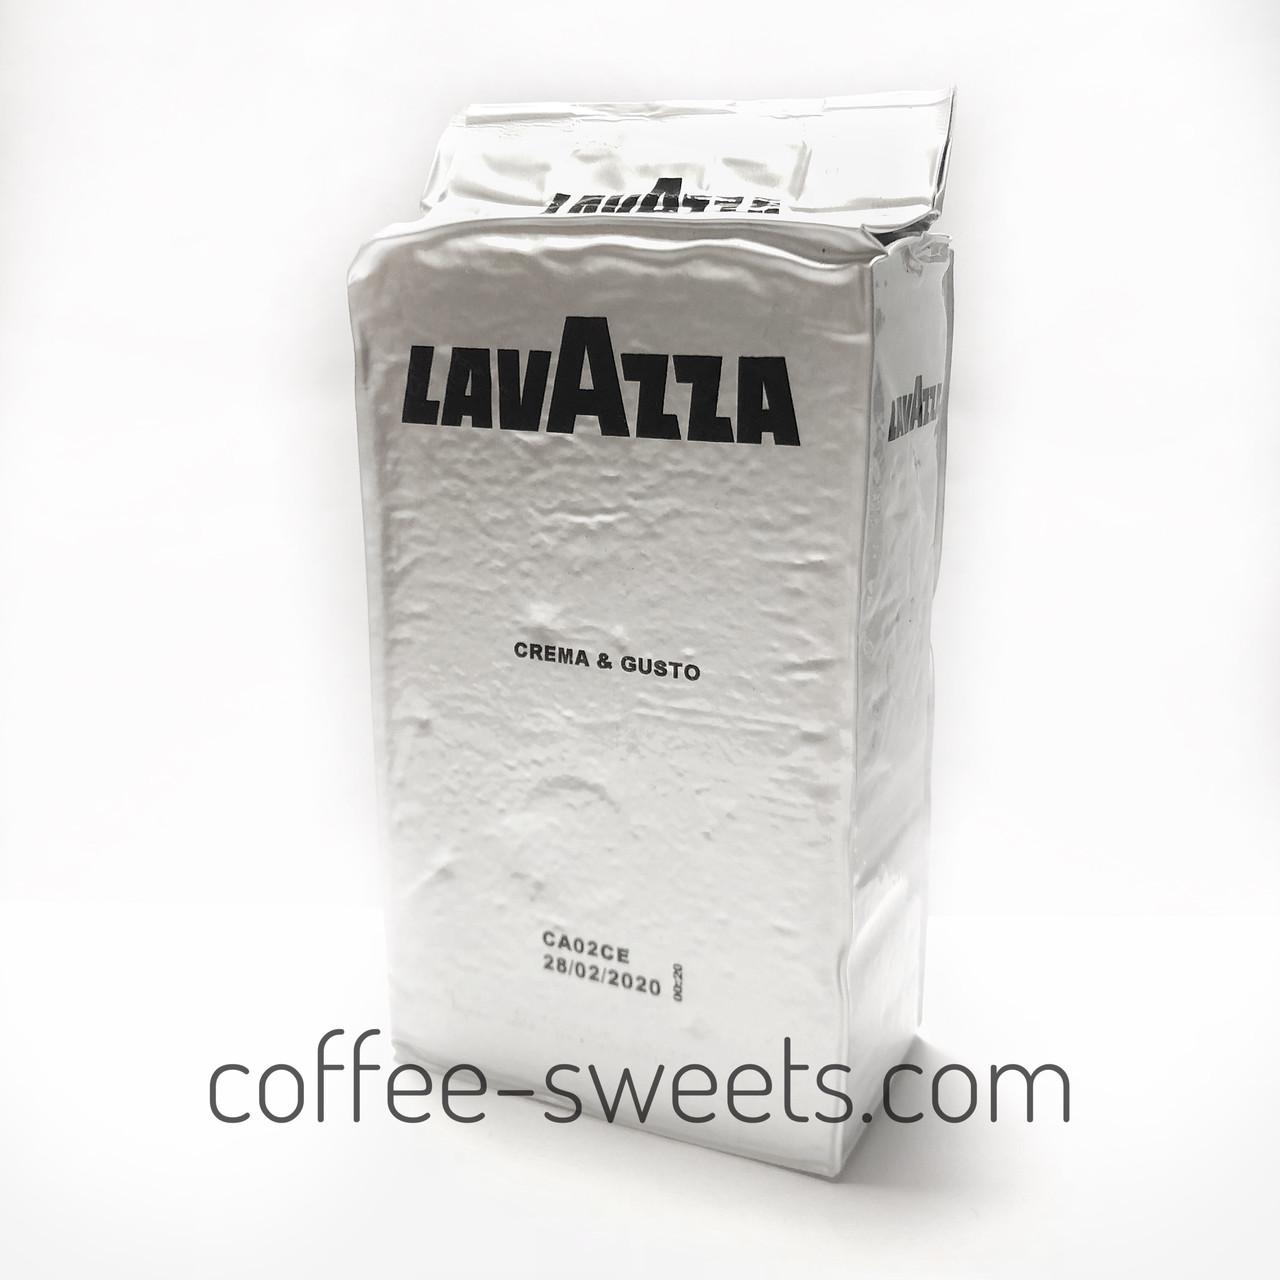 Кофе молотый Lavazza Crema & Gusto Classico 250g